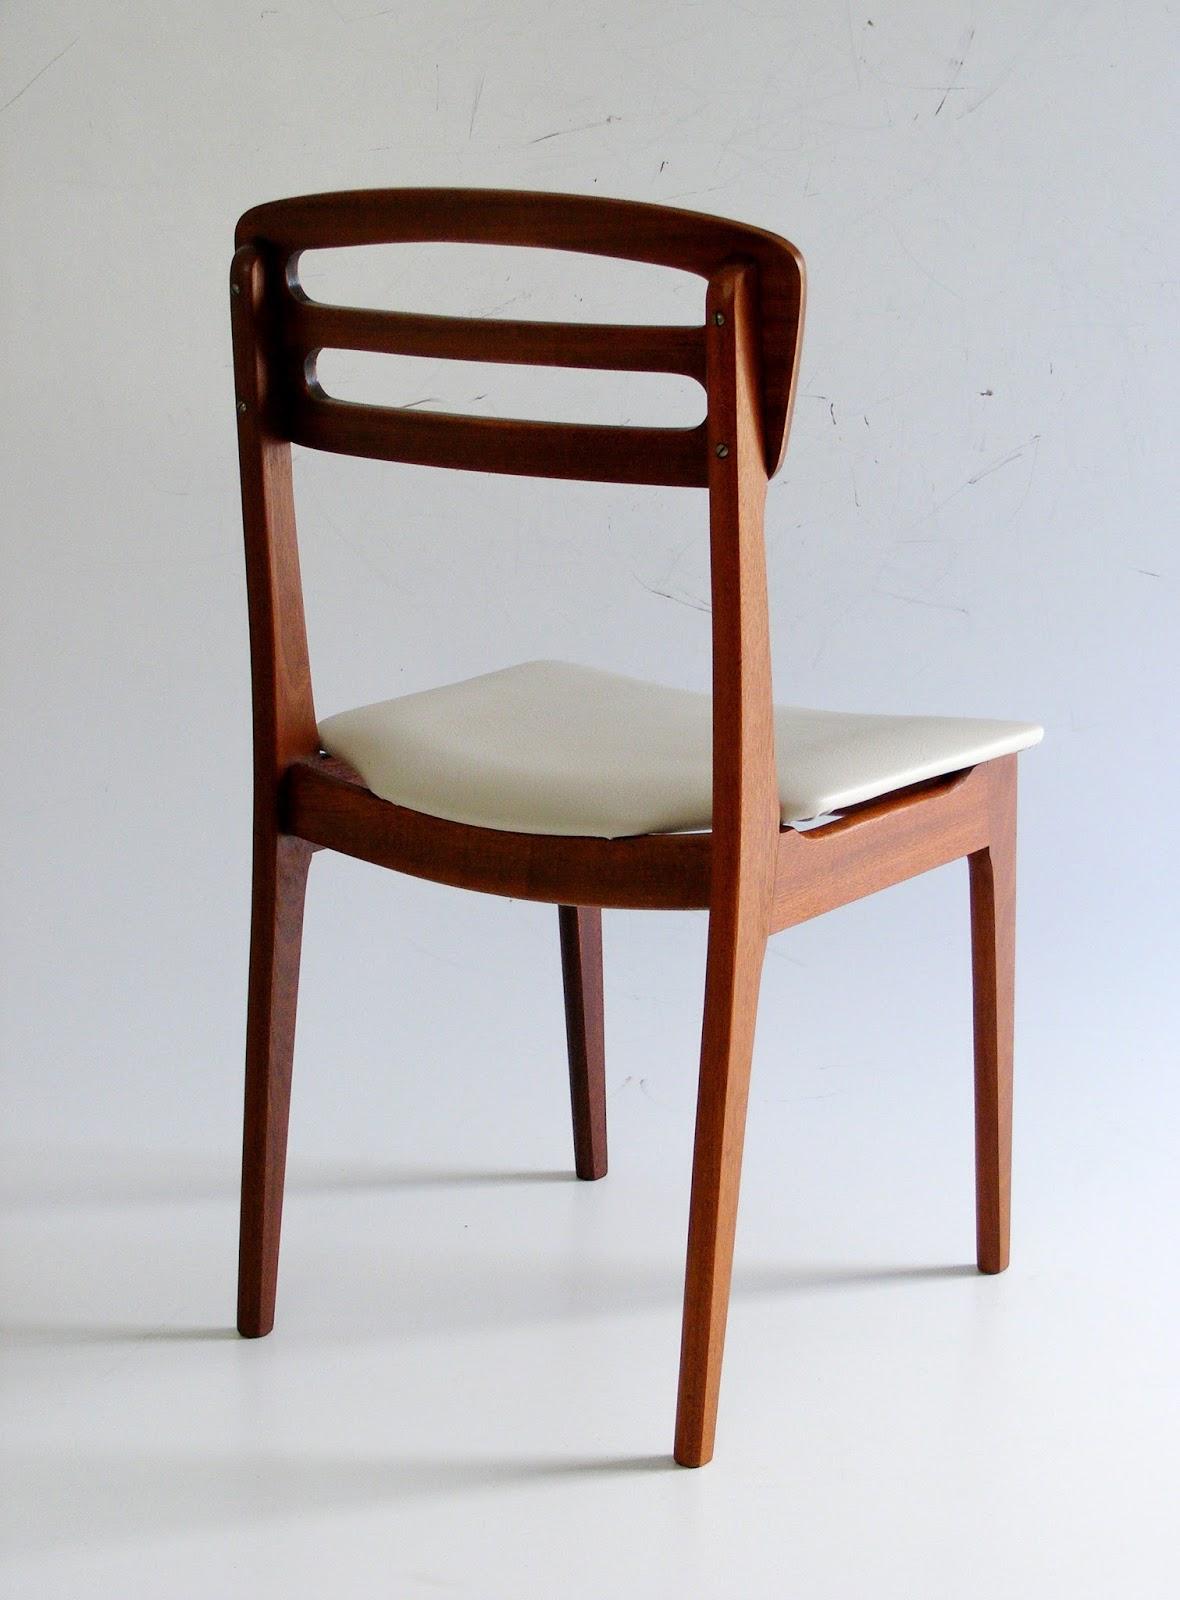 VAMP FURNITURE This weeks new vintage furniture stock at  : PIC2B6VAMPDININGCHAIRS021020152B252822529 from vampfurniture.blogspot.com size 1180 x 1600 jpeg 181kB